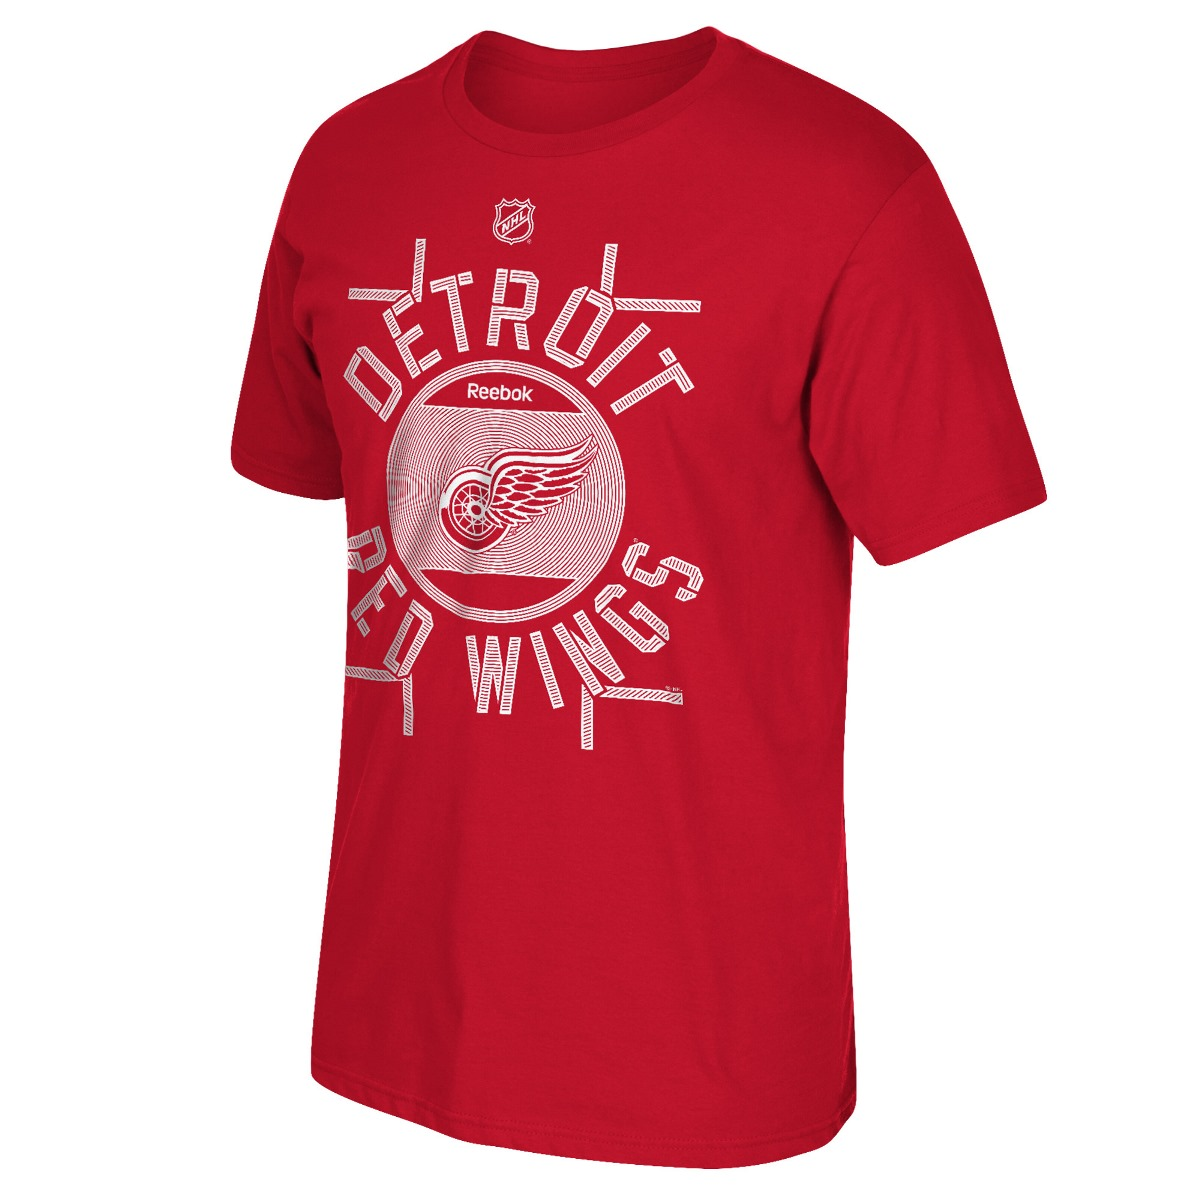 "Detroit Red Wings Reebok NHL ""Skate the Circles"" Men's T-Shirt by Reebok"